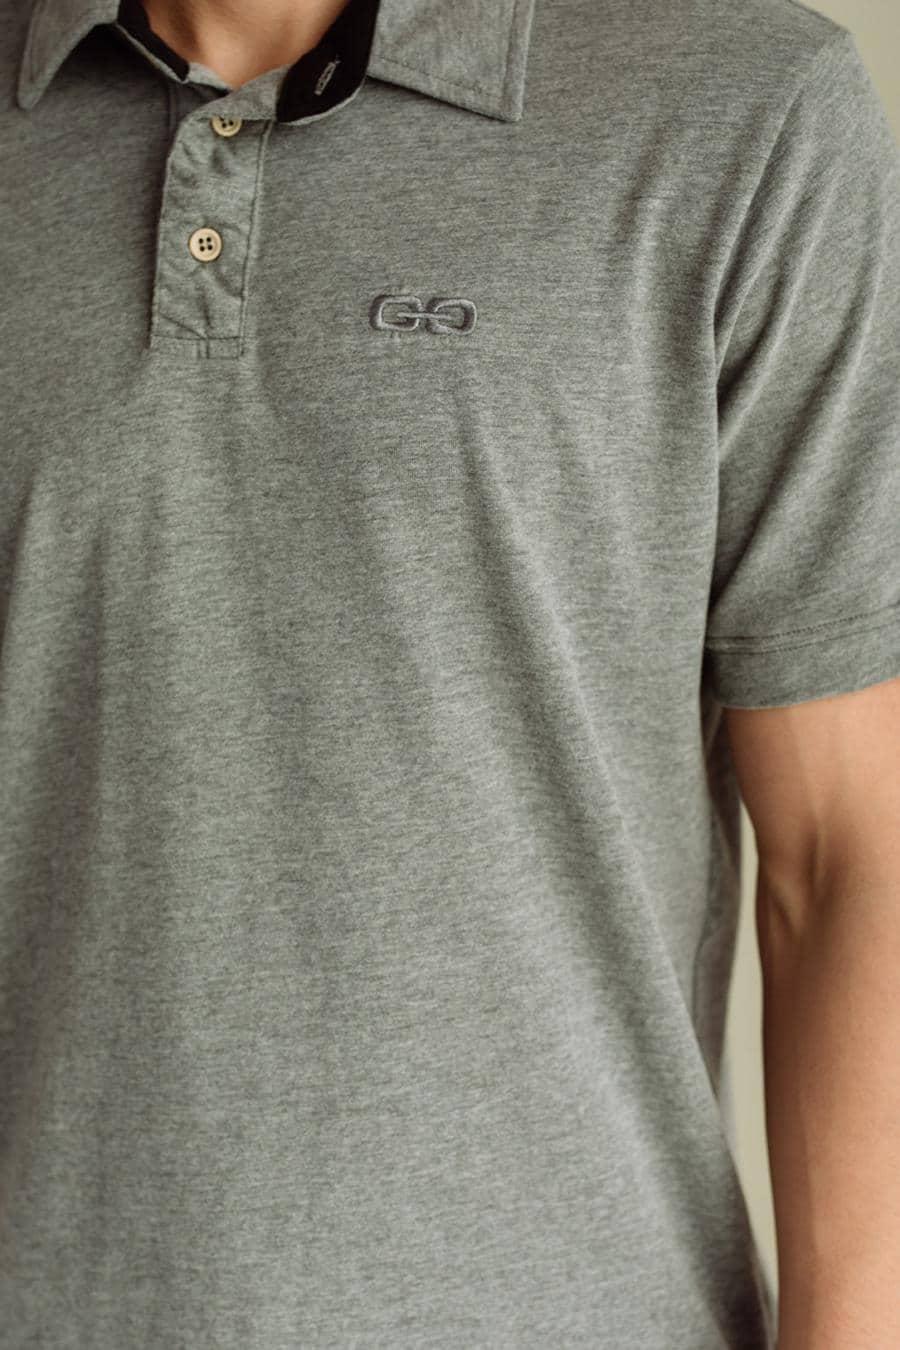 jagger muska majica kolekcija prolece leto 2021 ss 2021 kupi online jm 3014 05 5